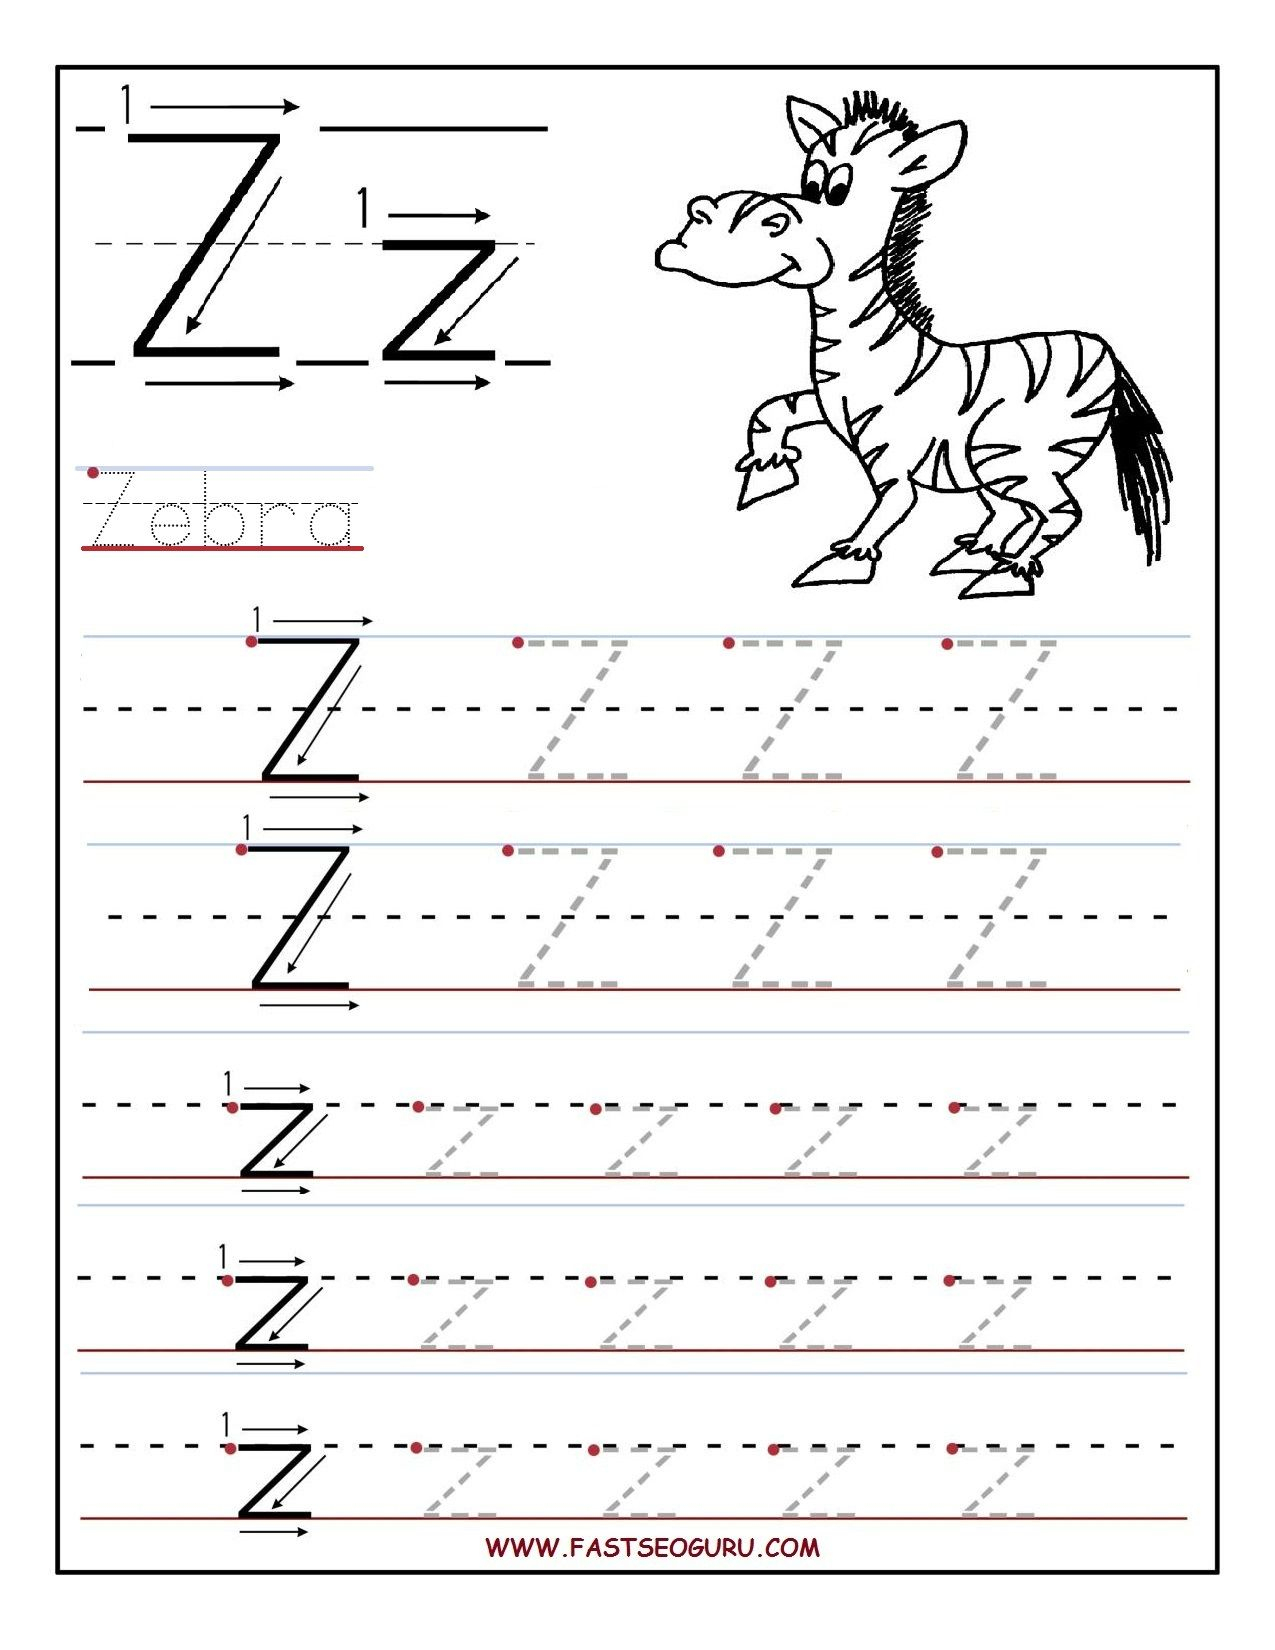 Pinvilfran Gason On Decor | Letter Tracing Worksheets, Alphabet - Letter Z Worksheets Free Printable